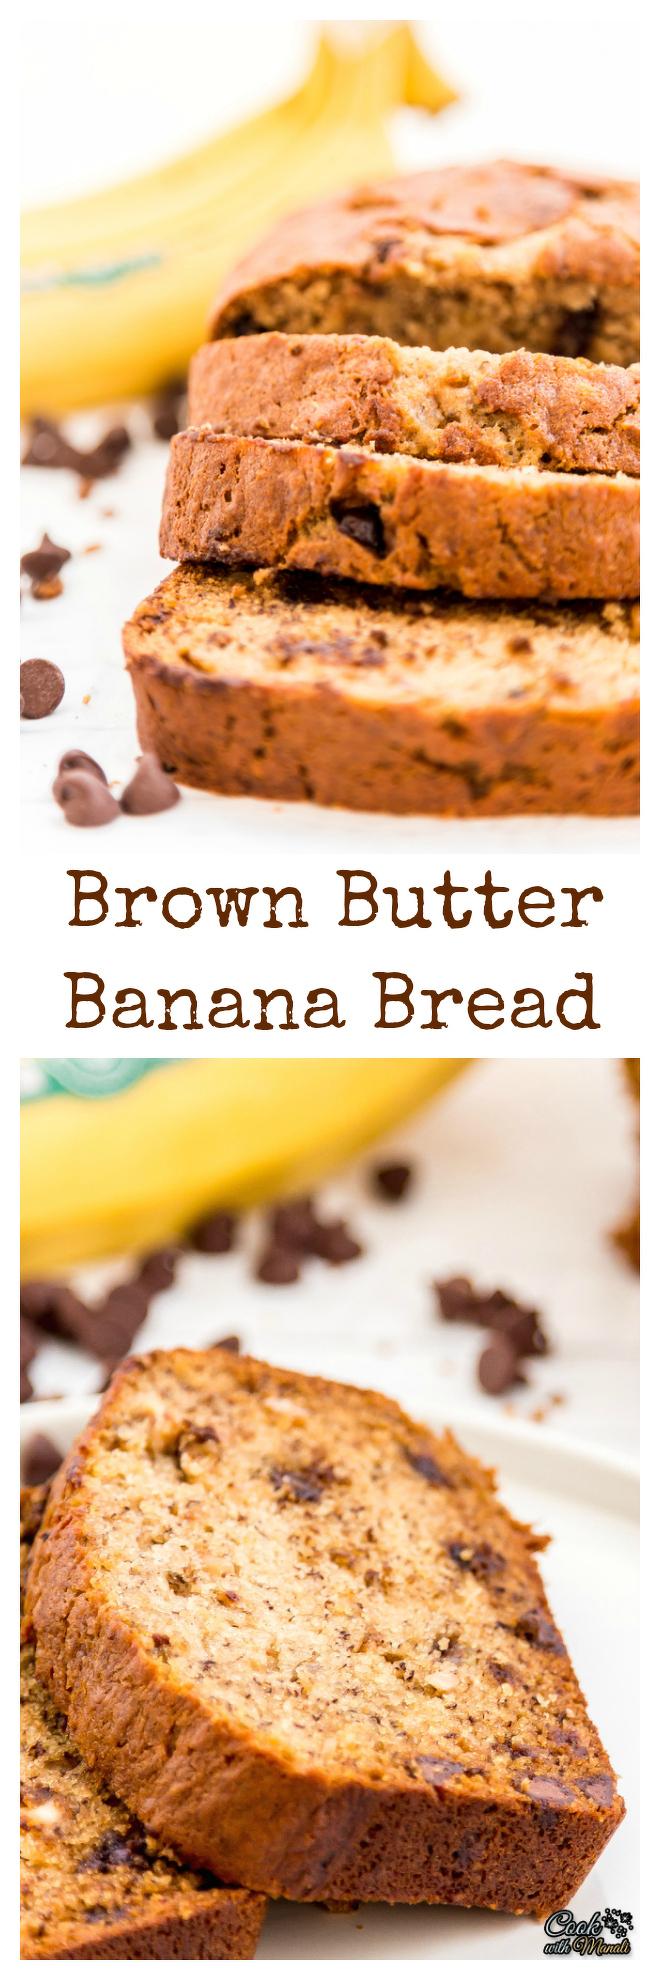 Brown Butter Banana Bread Collage-nocwm